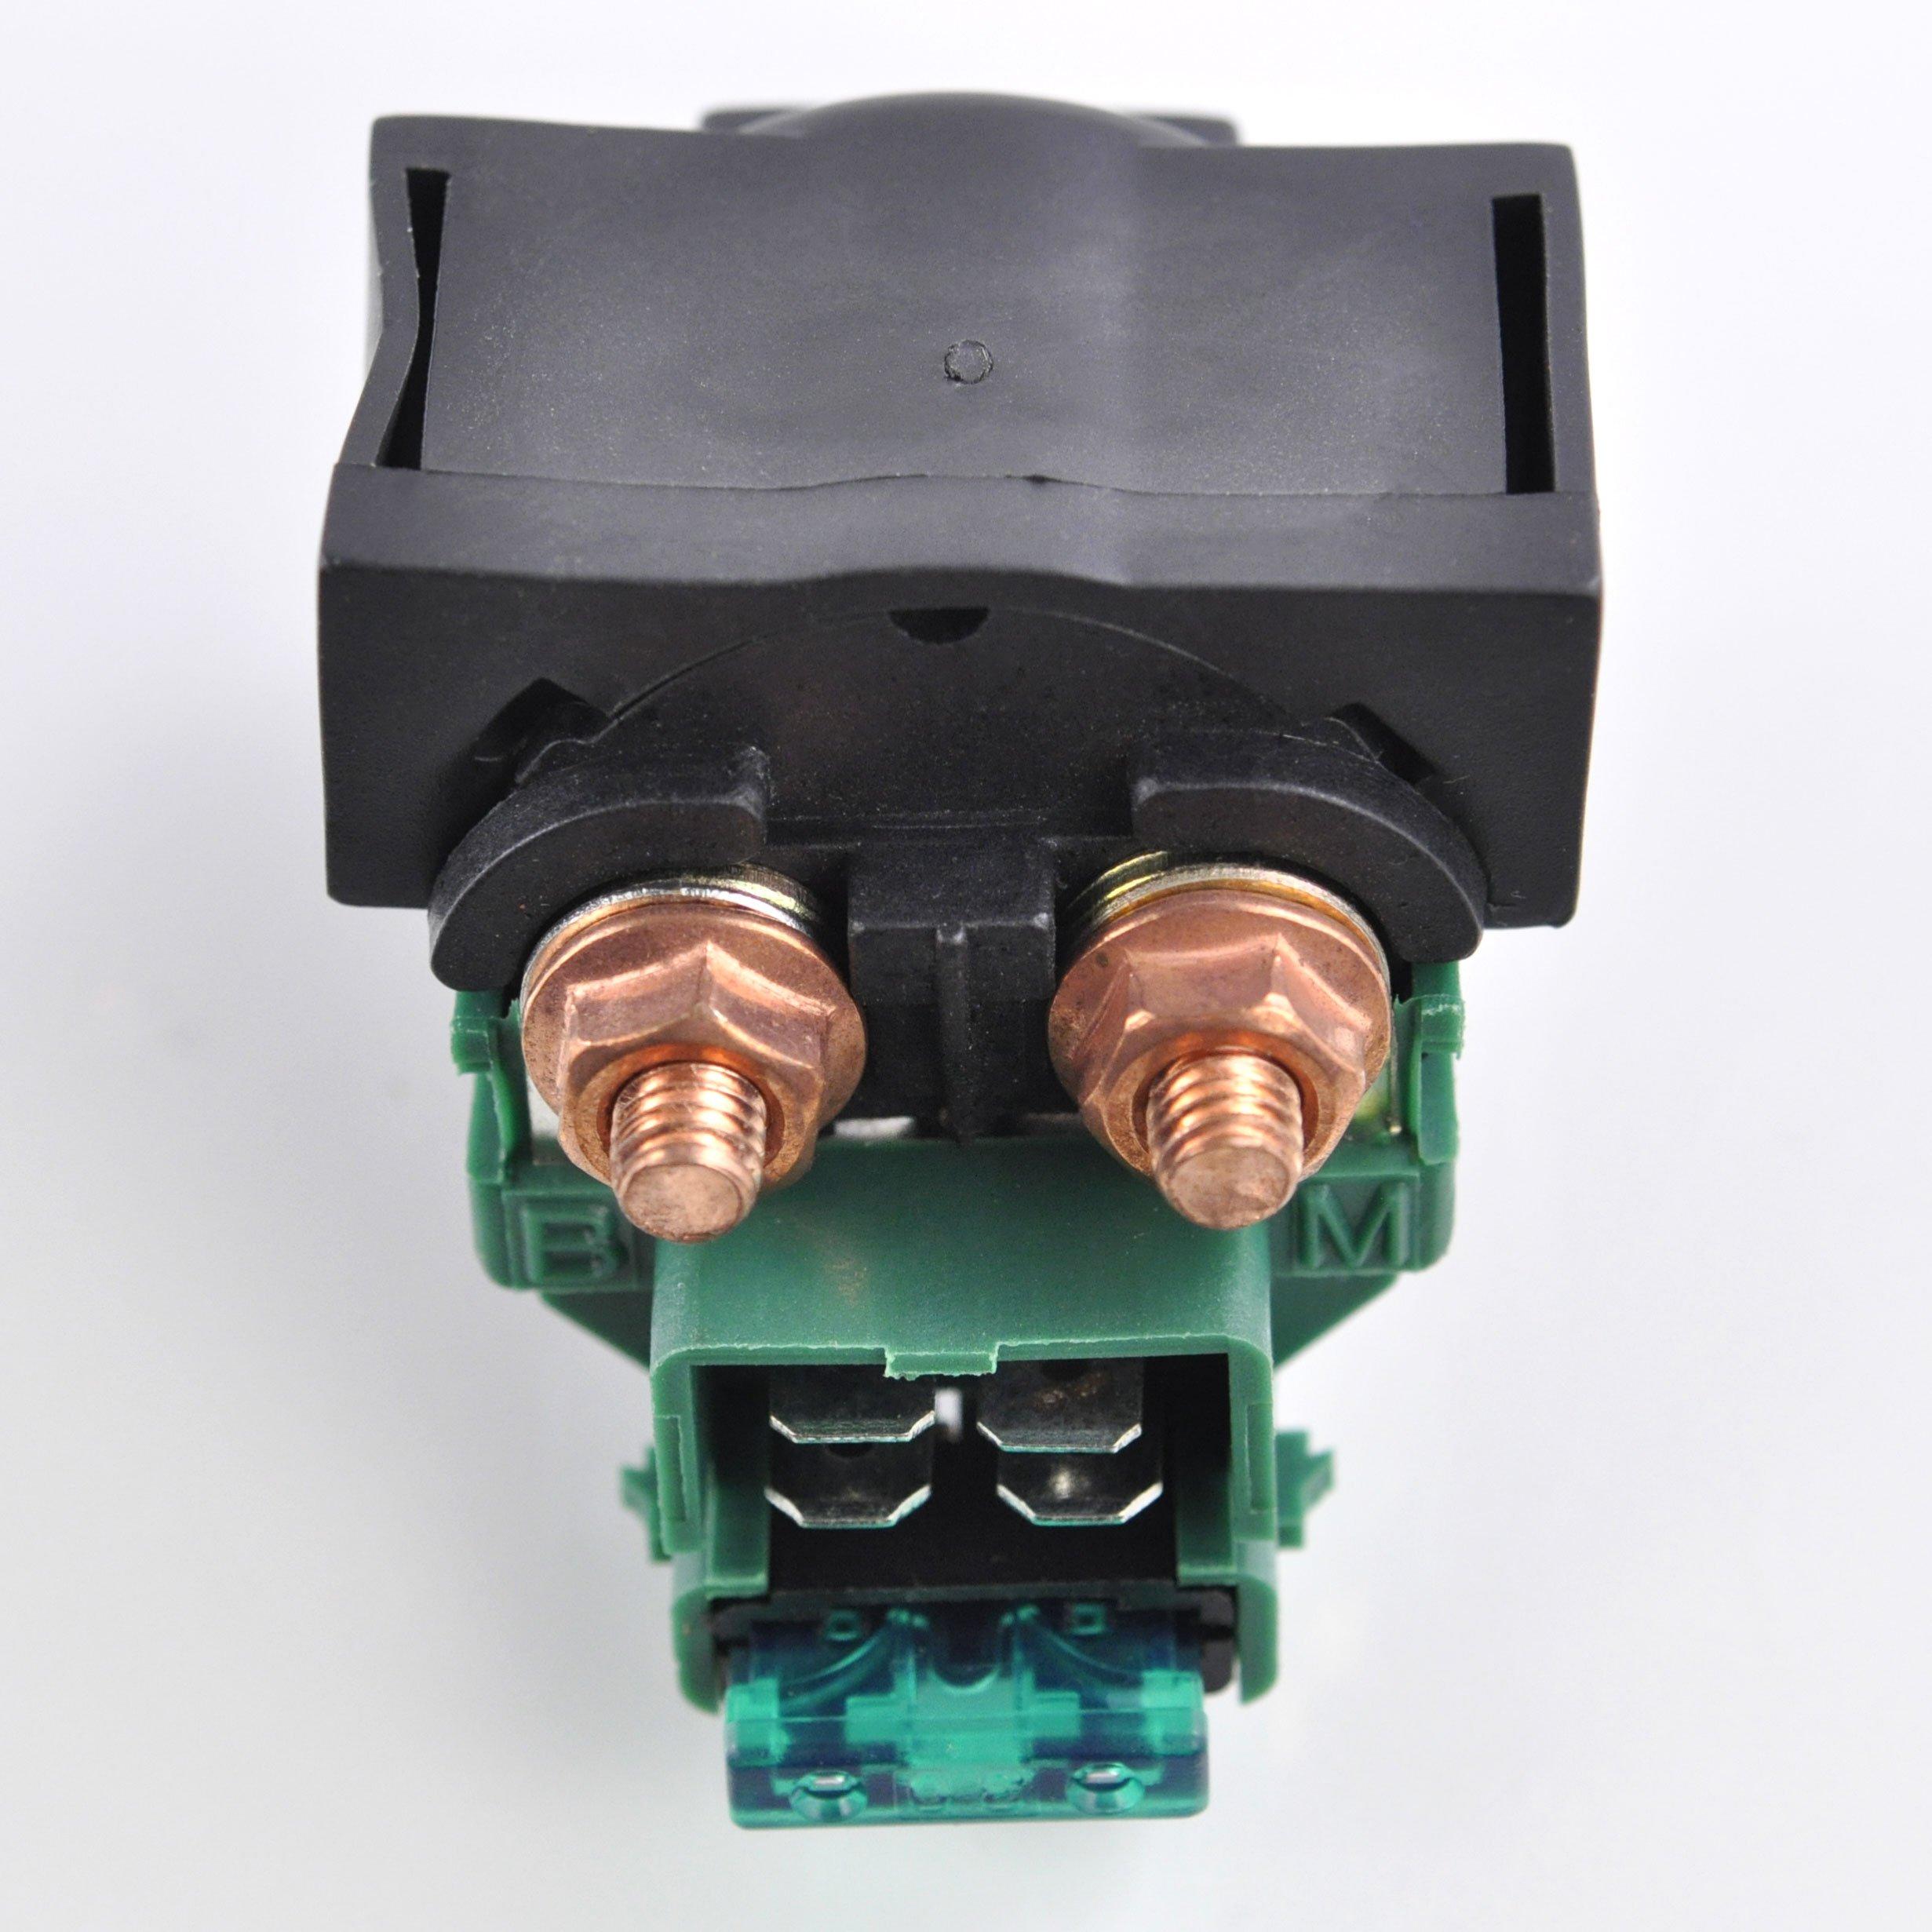 Starter Relay Solenoid For Honda CB CBR 400 650 750 900 1000 CBX CX 500 1000 GL 1100 1200 1500 VT VF 600 750 OEM Repl.#35850-425-017 35850-MB0-007 35850-ME8-007 35850-MK3-671 38300-415-P00